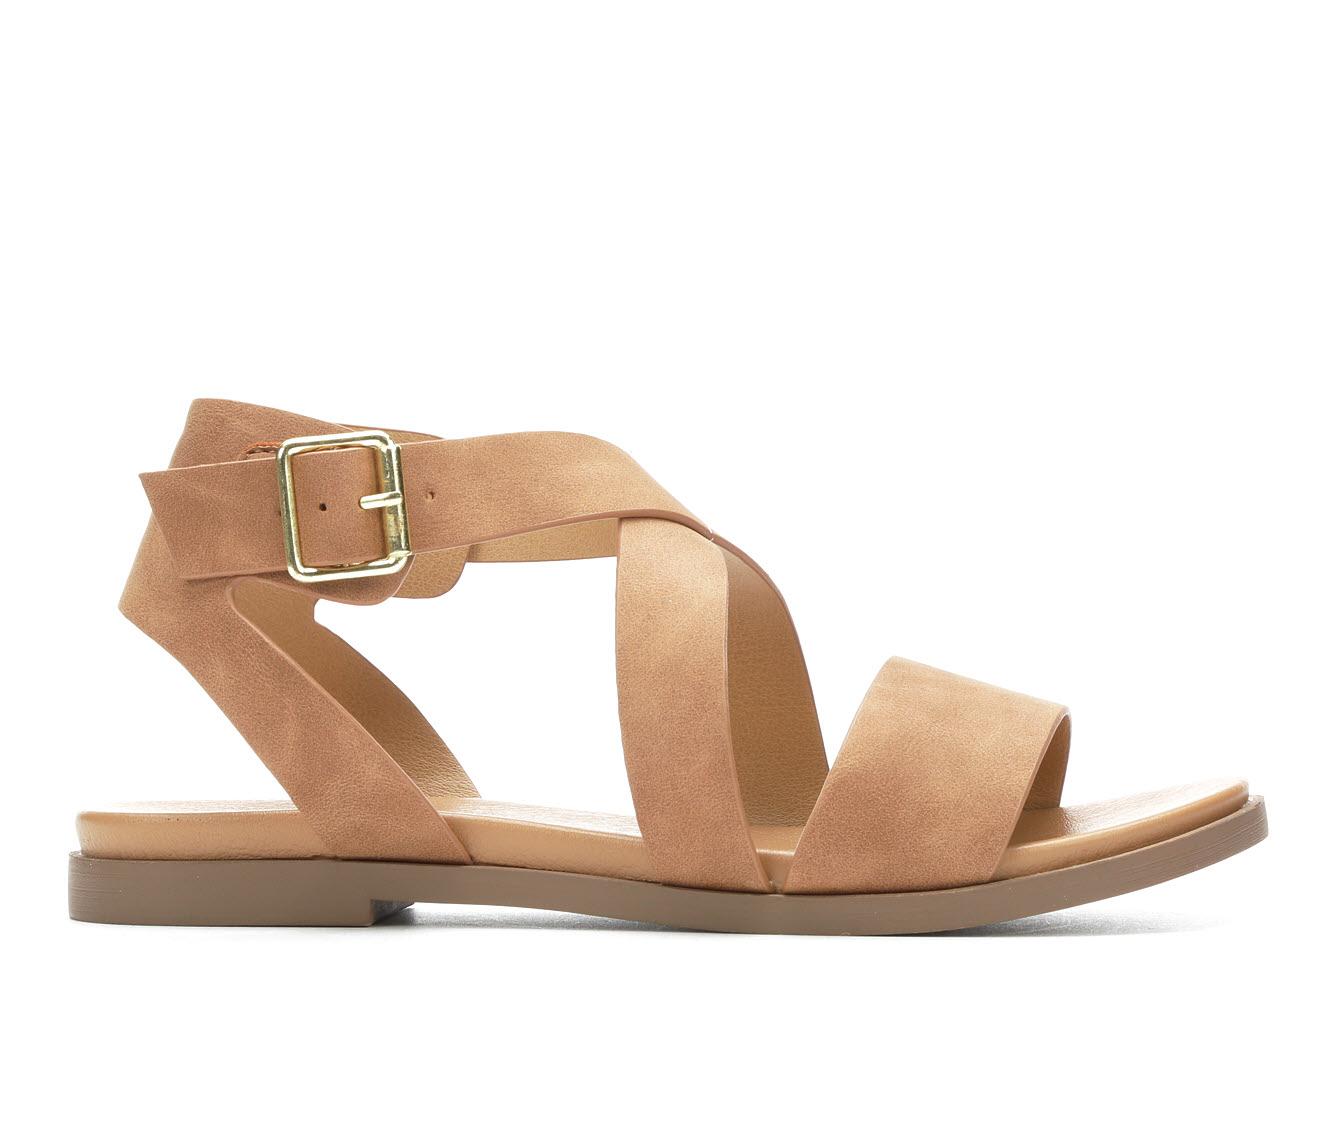 Solanz Spend Women's Sandal (Beige Faux Leather)